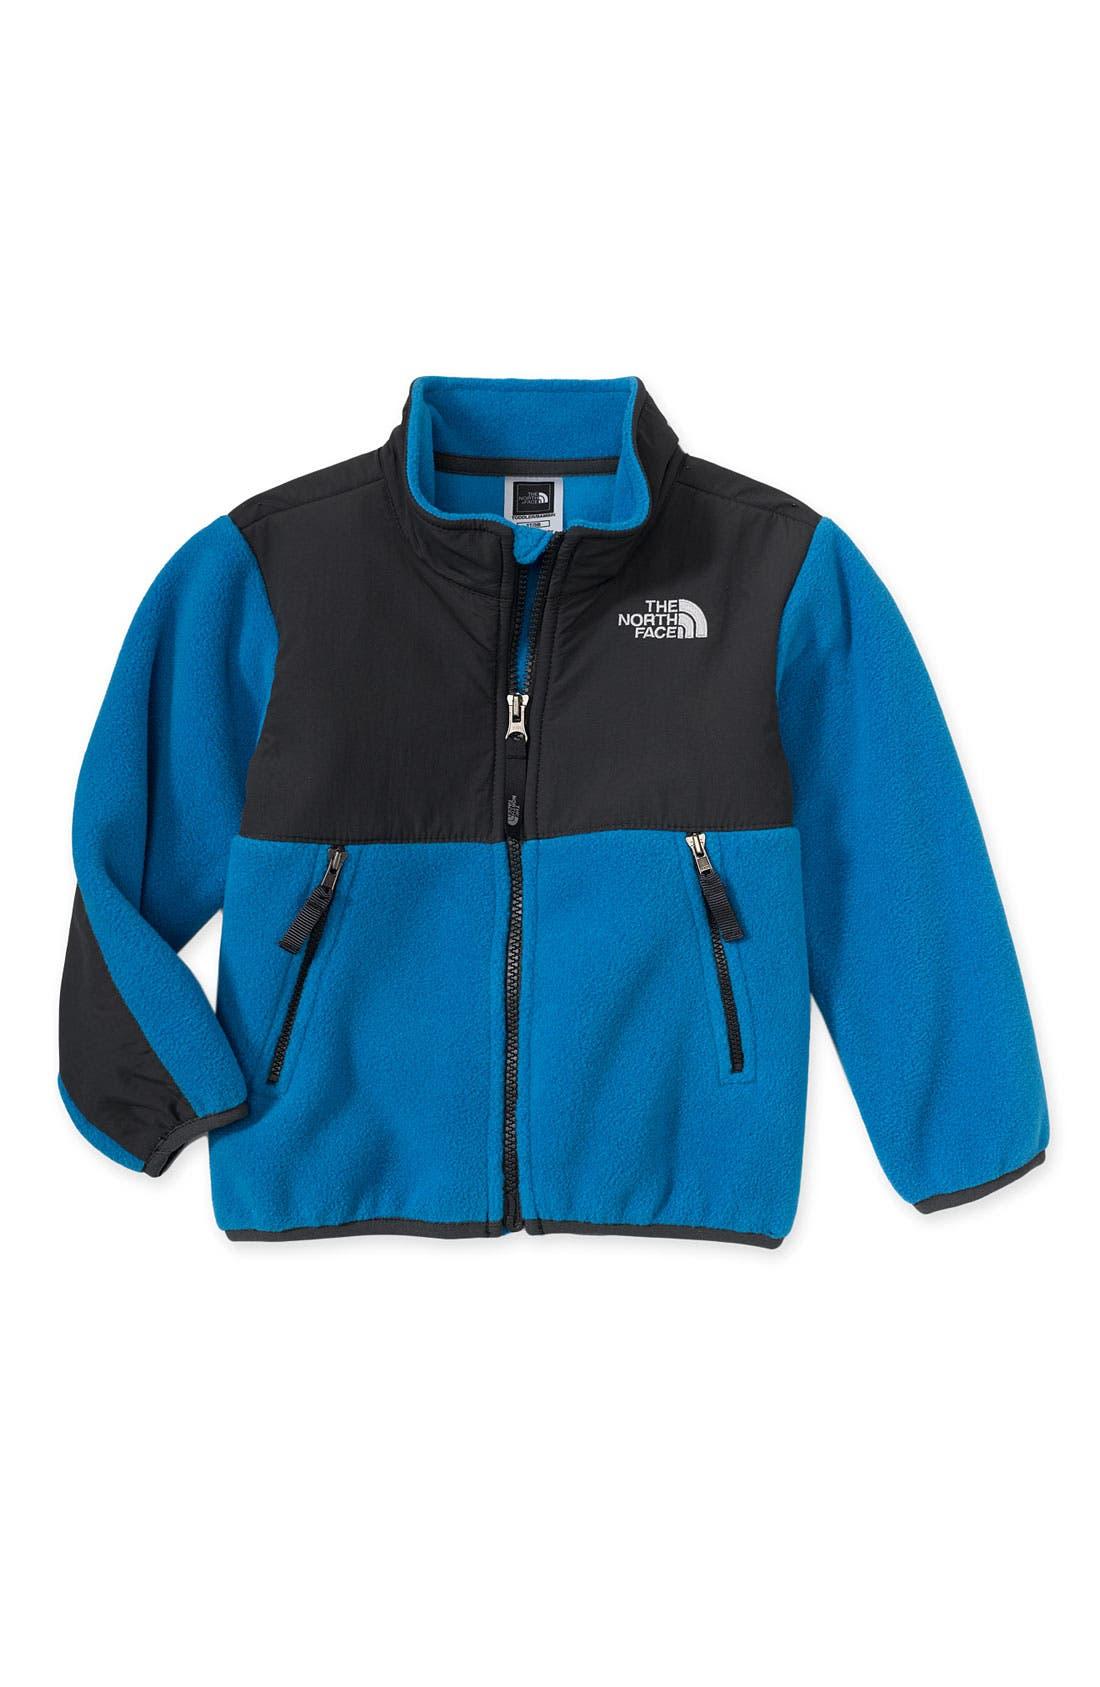 Main Image - The North Face 'Denali' Recycled Fleece Jacket (Toddler Boys)